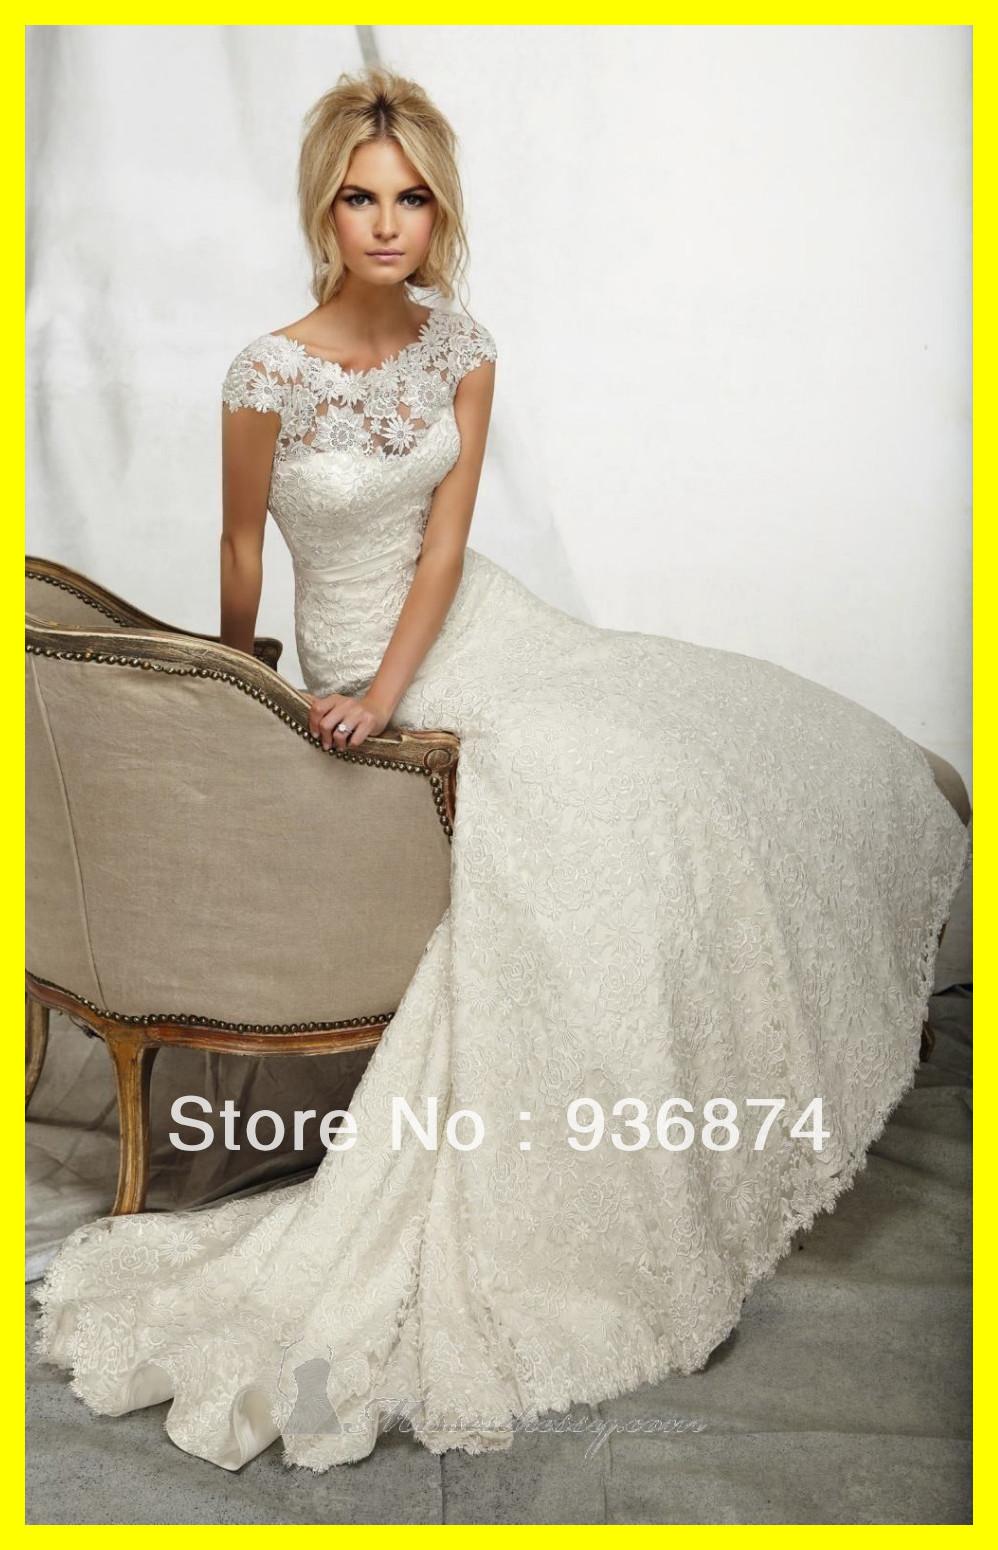 Satin Wedding Dresses Summer Dress High Street Off White